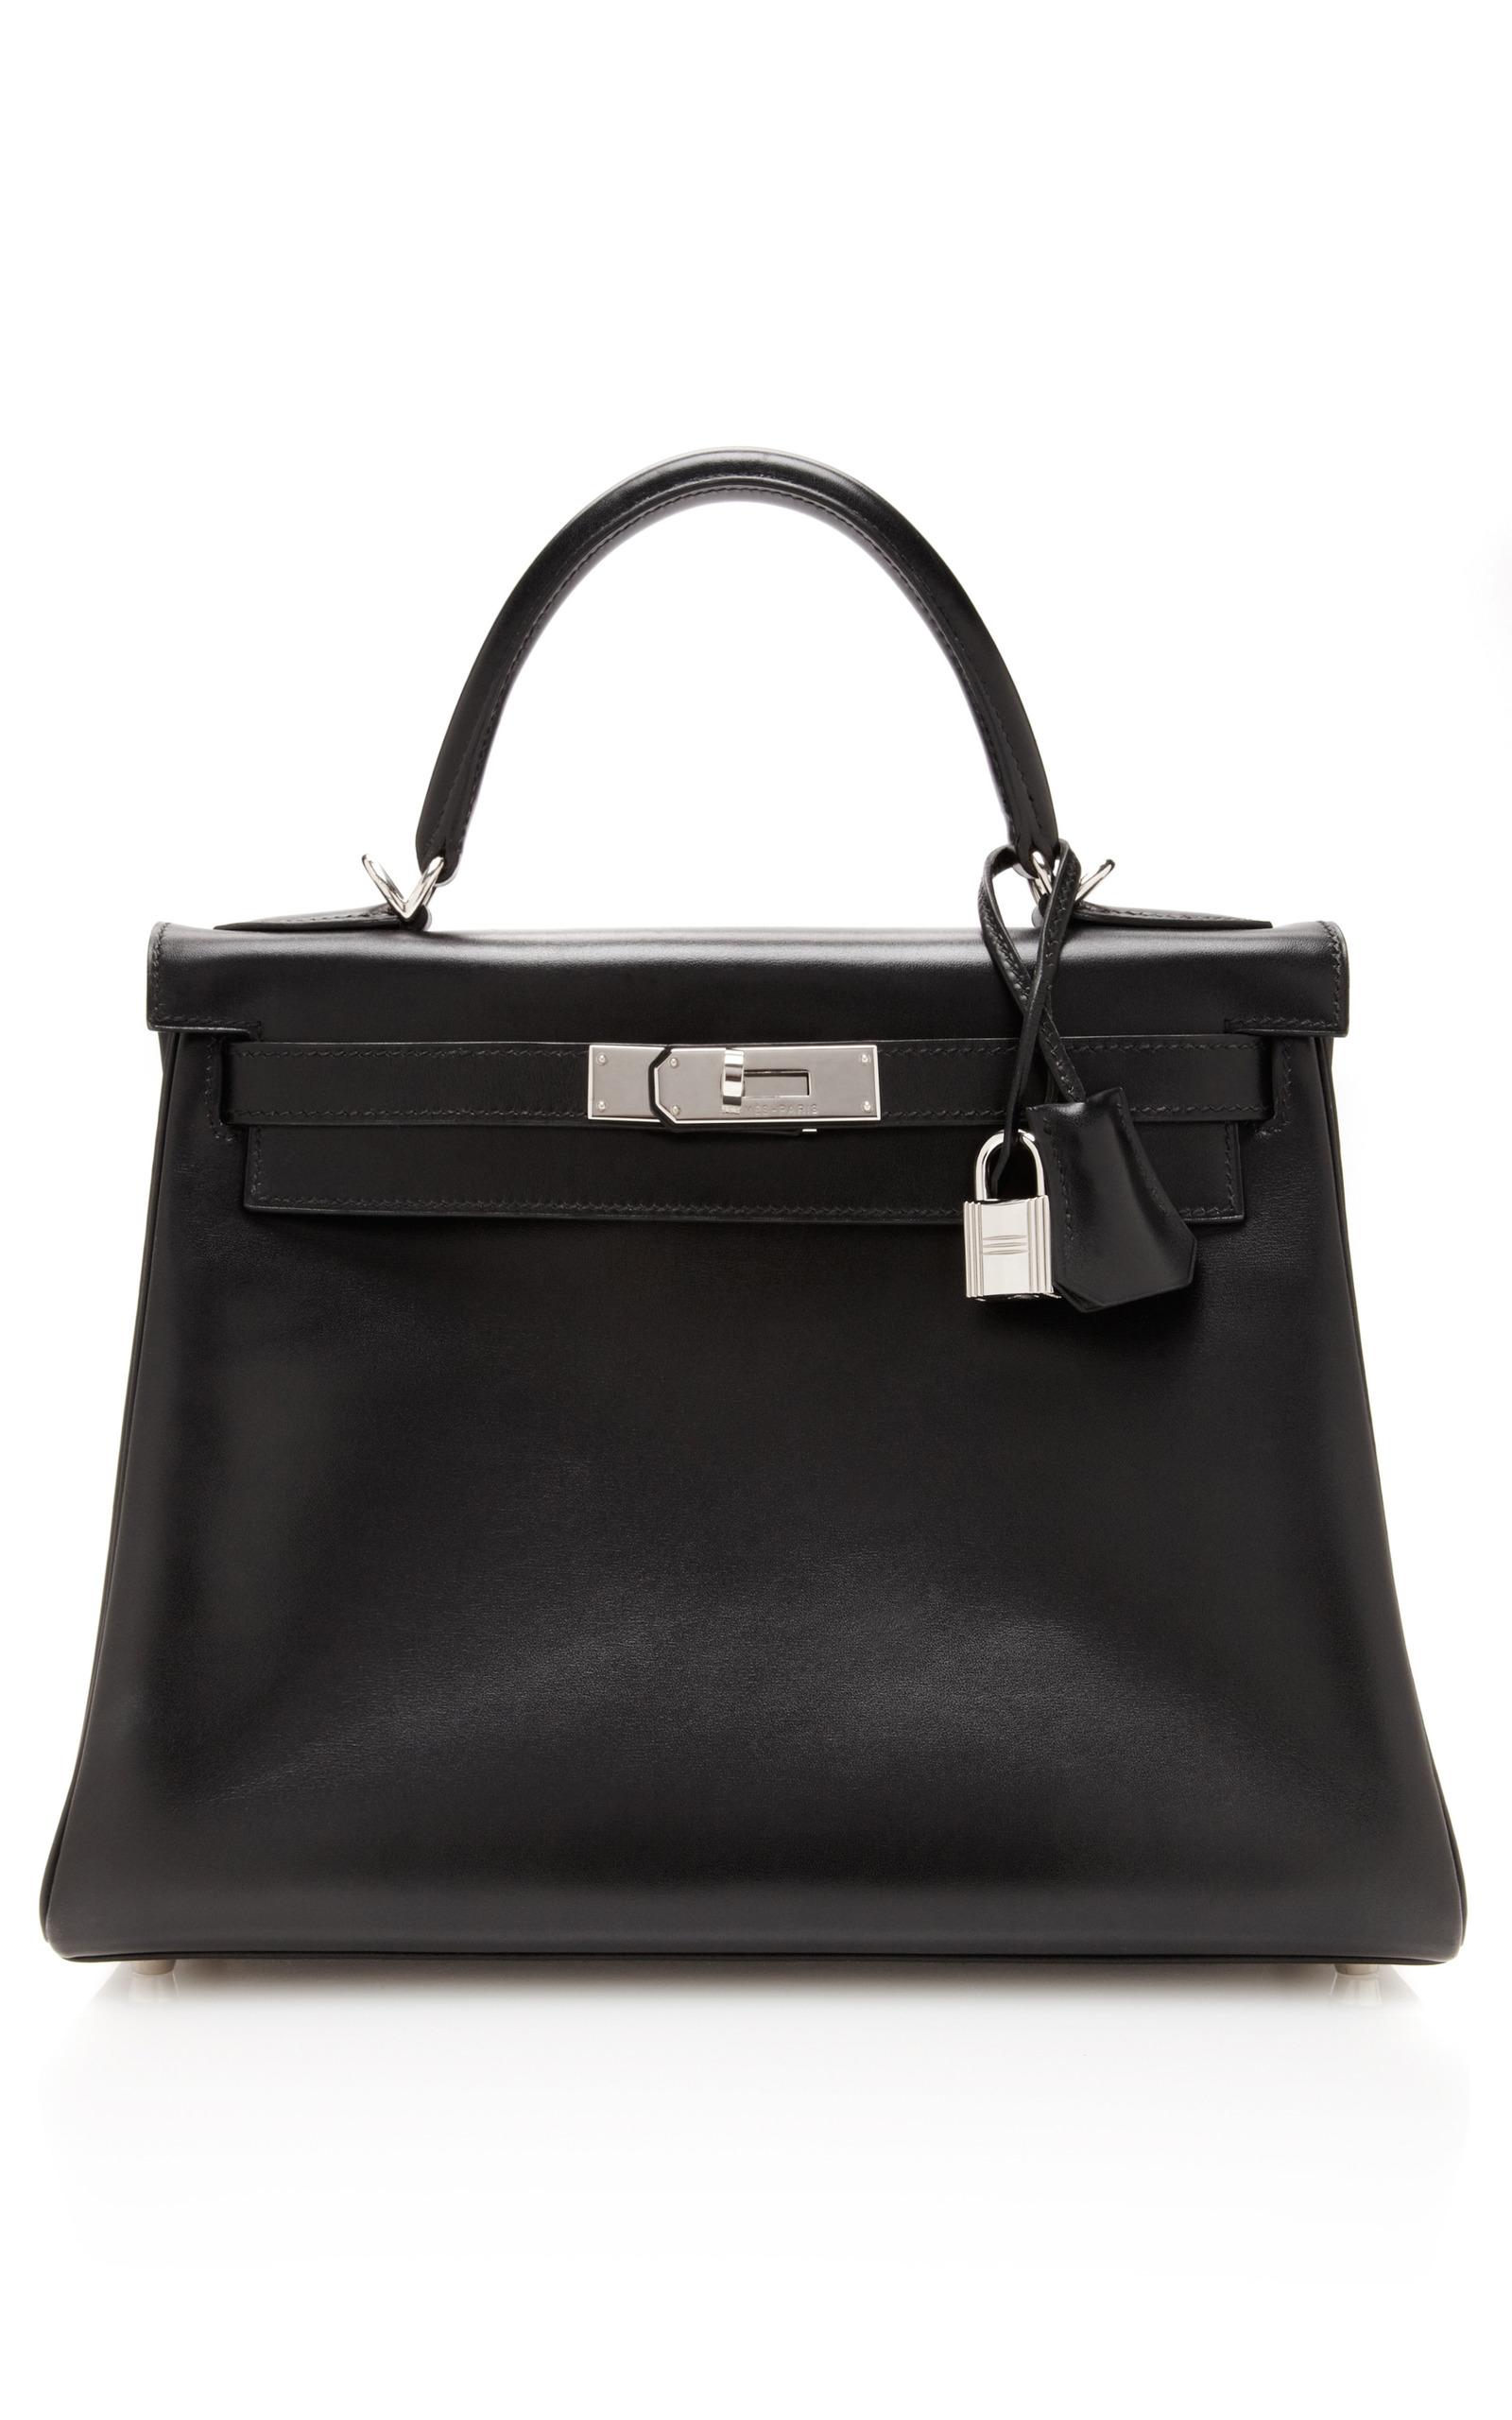 611704ac1dd1 Hermes 28Cm Black Calf Box Leather Retourne Kelly by Hermes Vintage ...